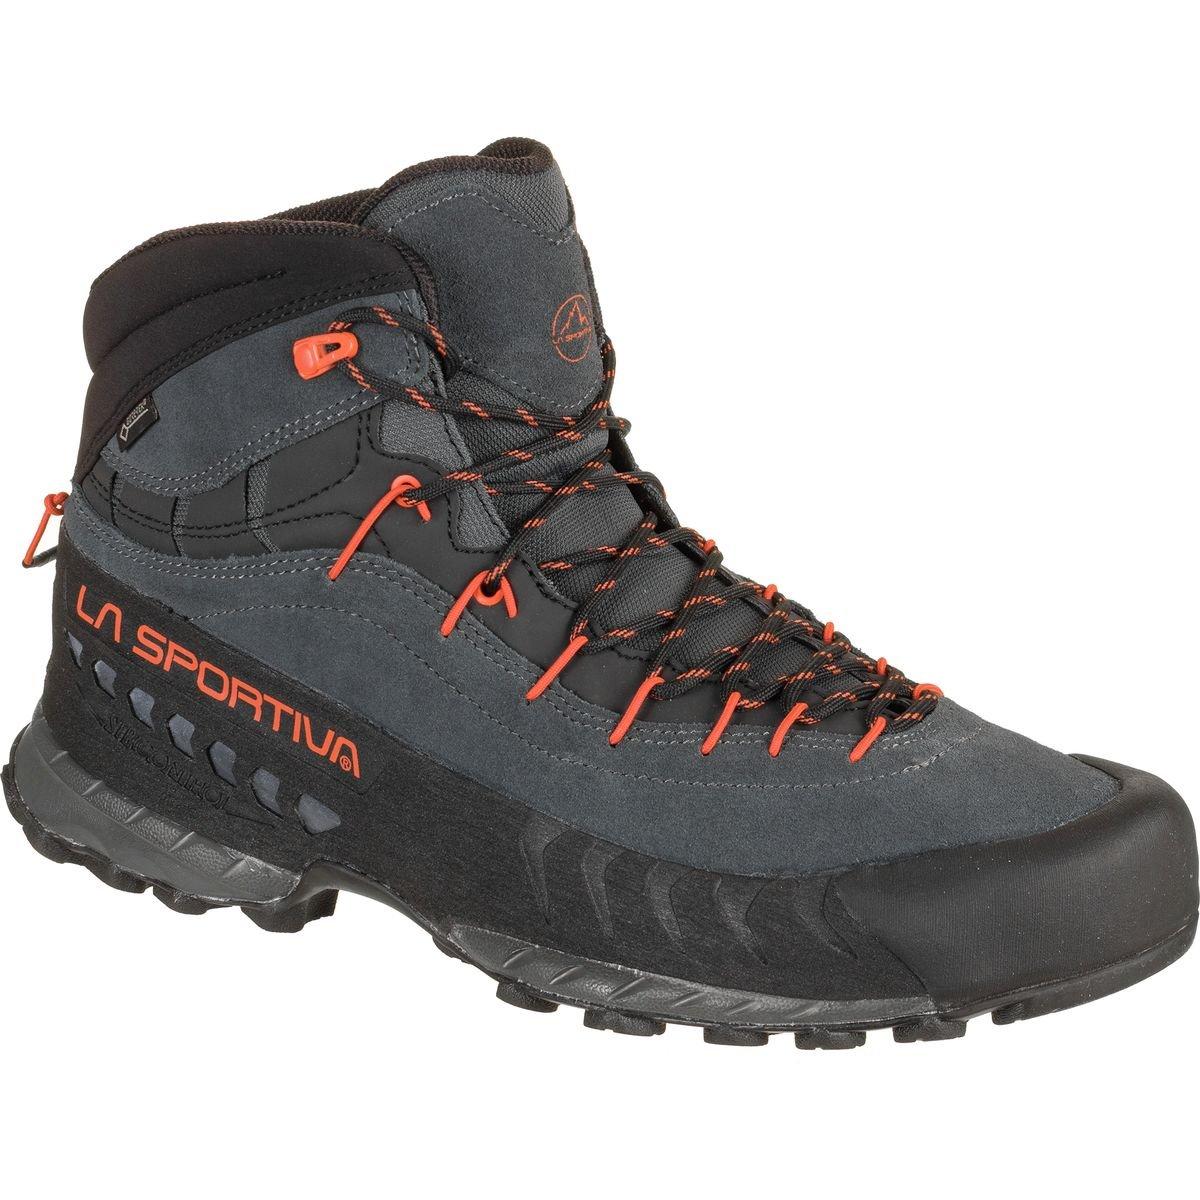 TX4 MID GTX Hiking Shoe - Men's